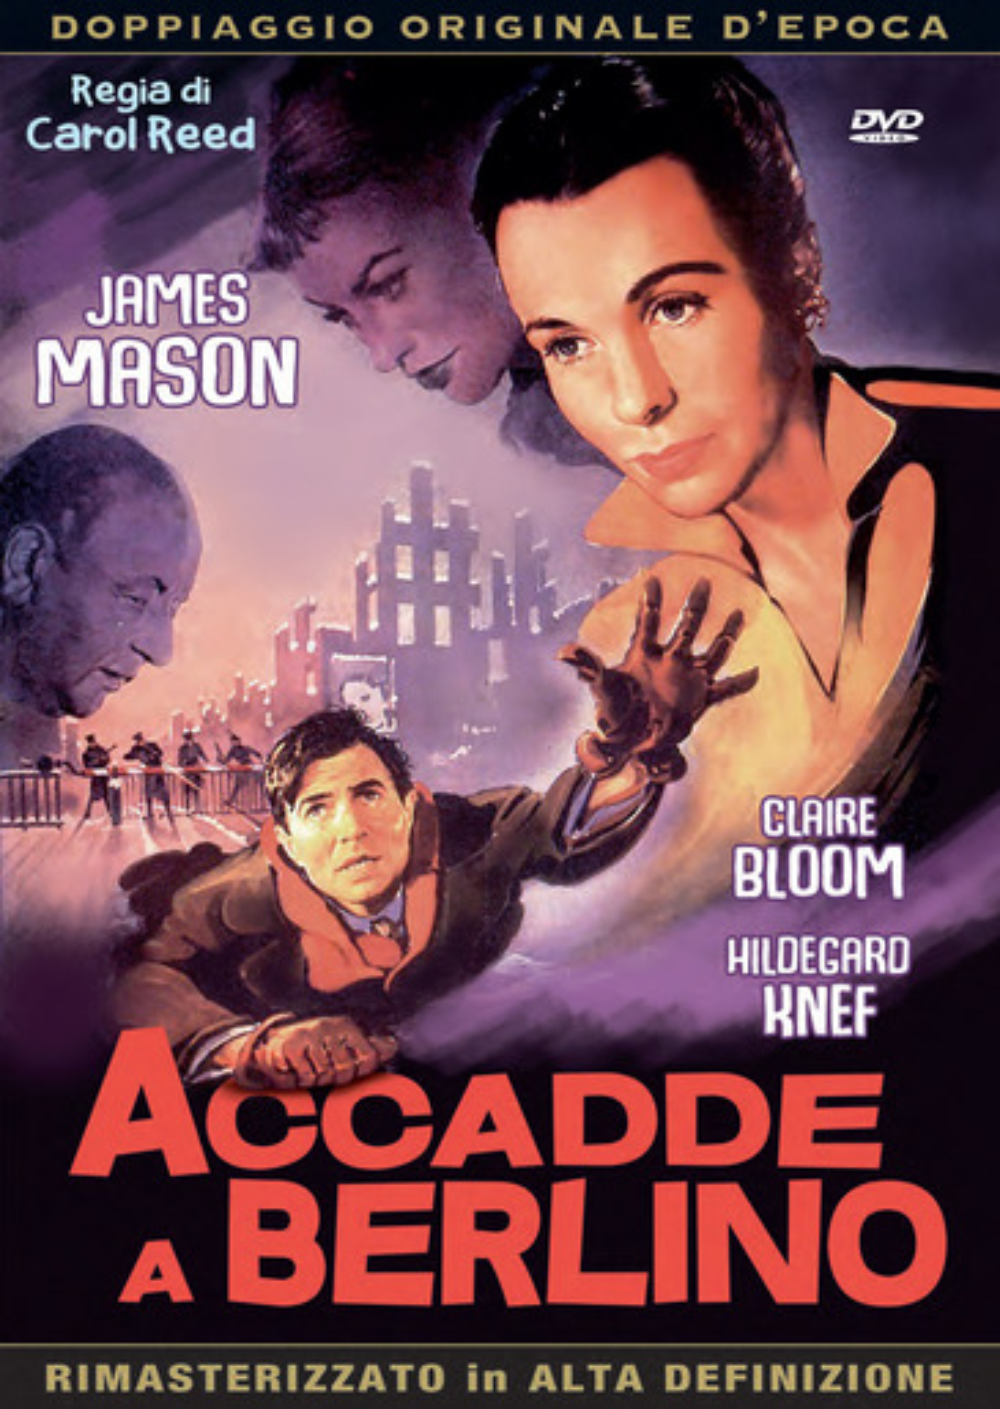 ACCADDE A BERLINO (DVD)